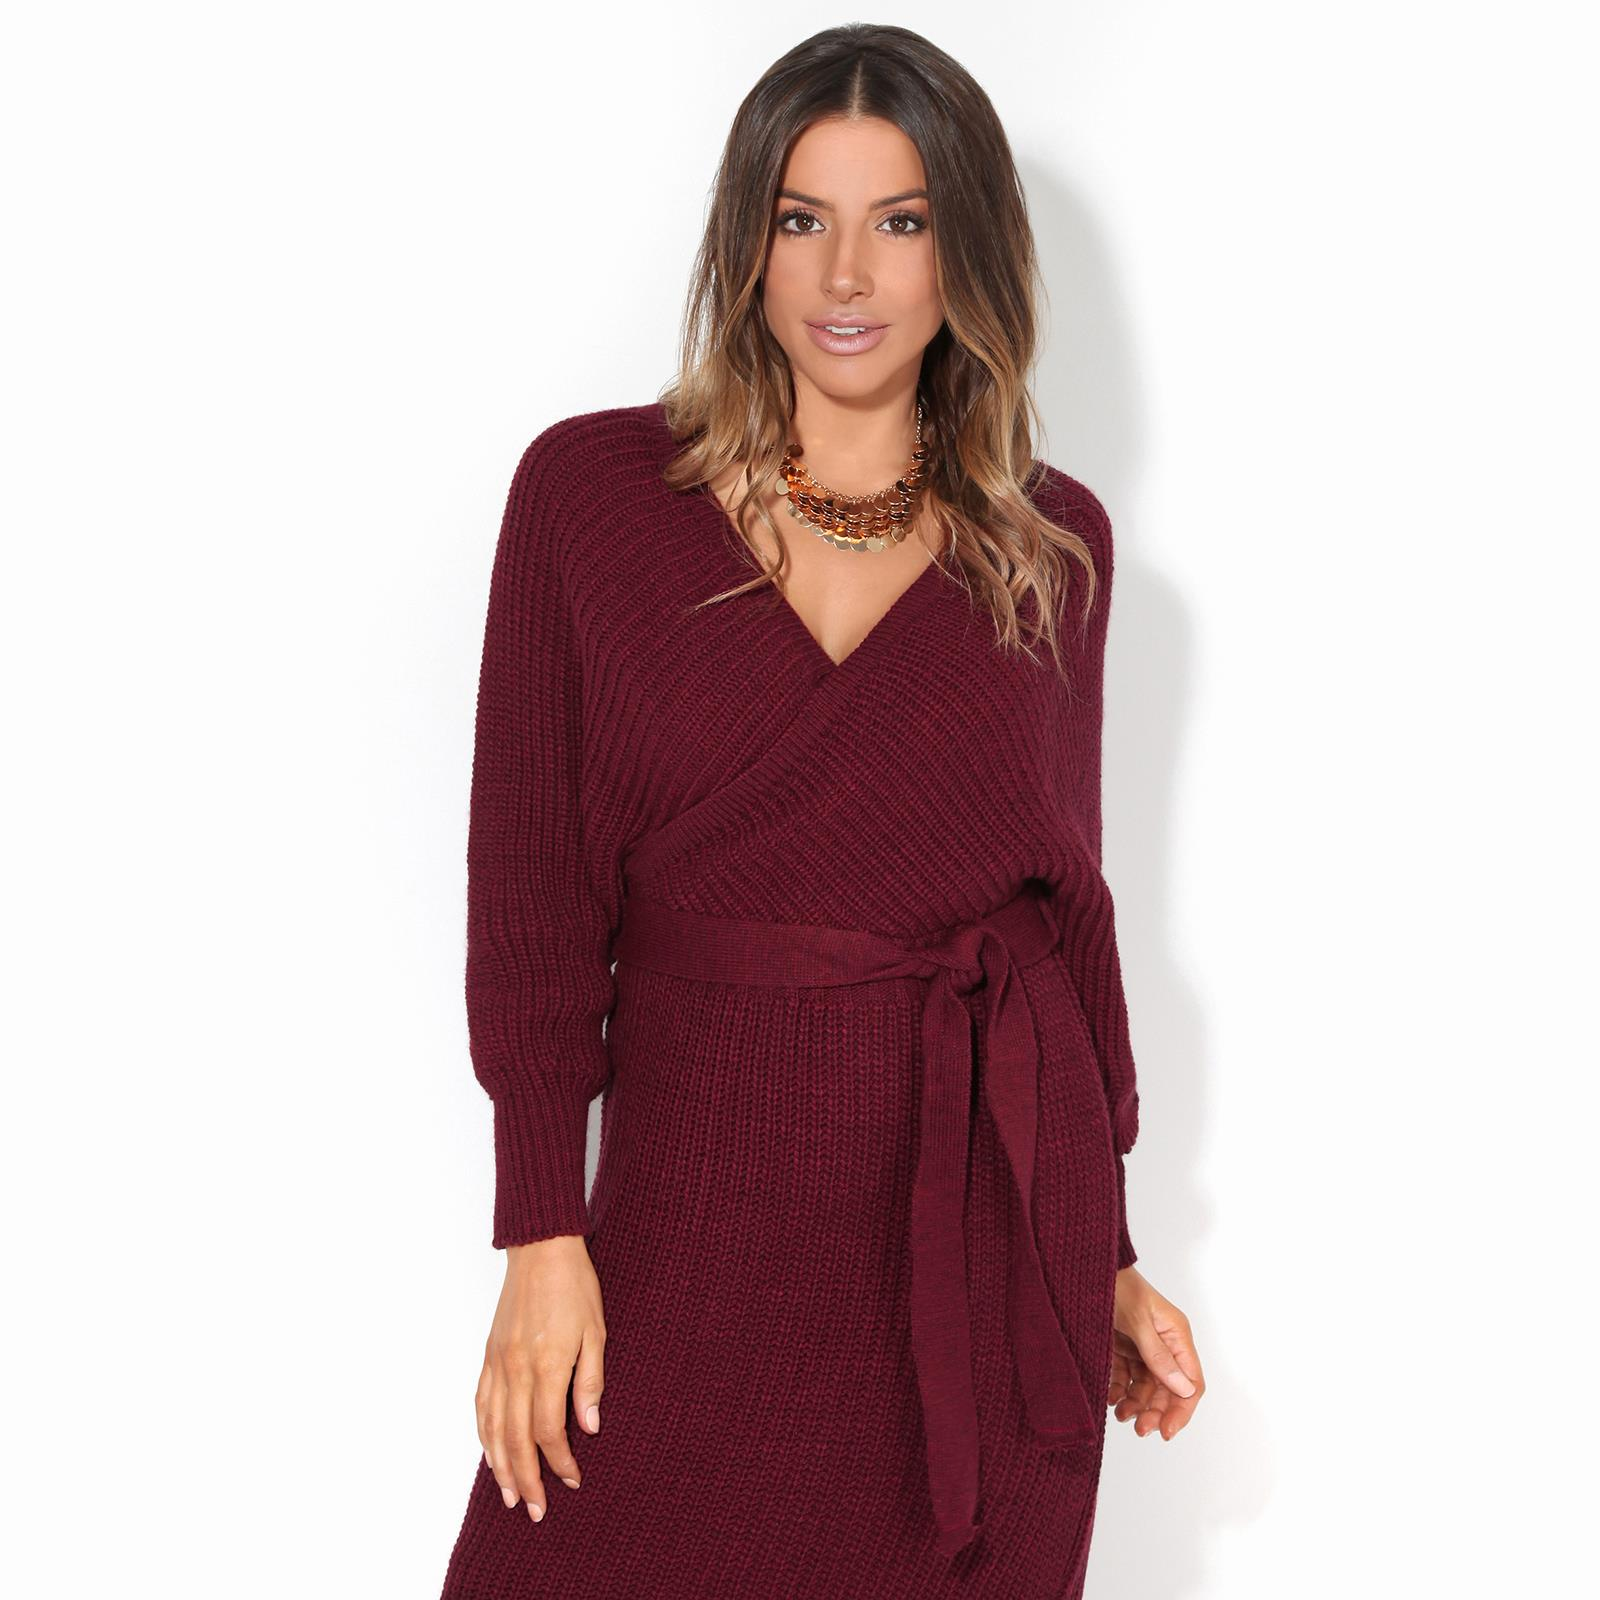 Womens-Ladies-Jumper-Dress-Chunky-Knit-Wrap-V-Neck-Maxi-Long-Sleeve-Winter-Top thumbnail 12